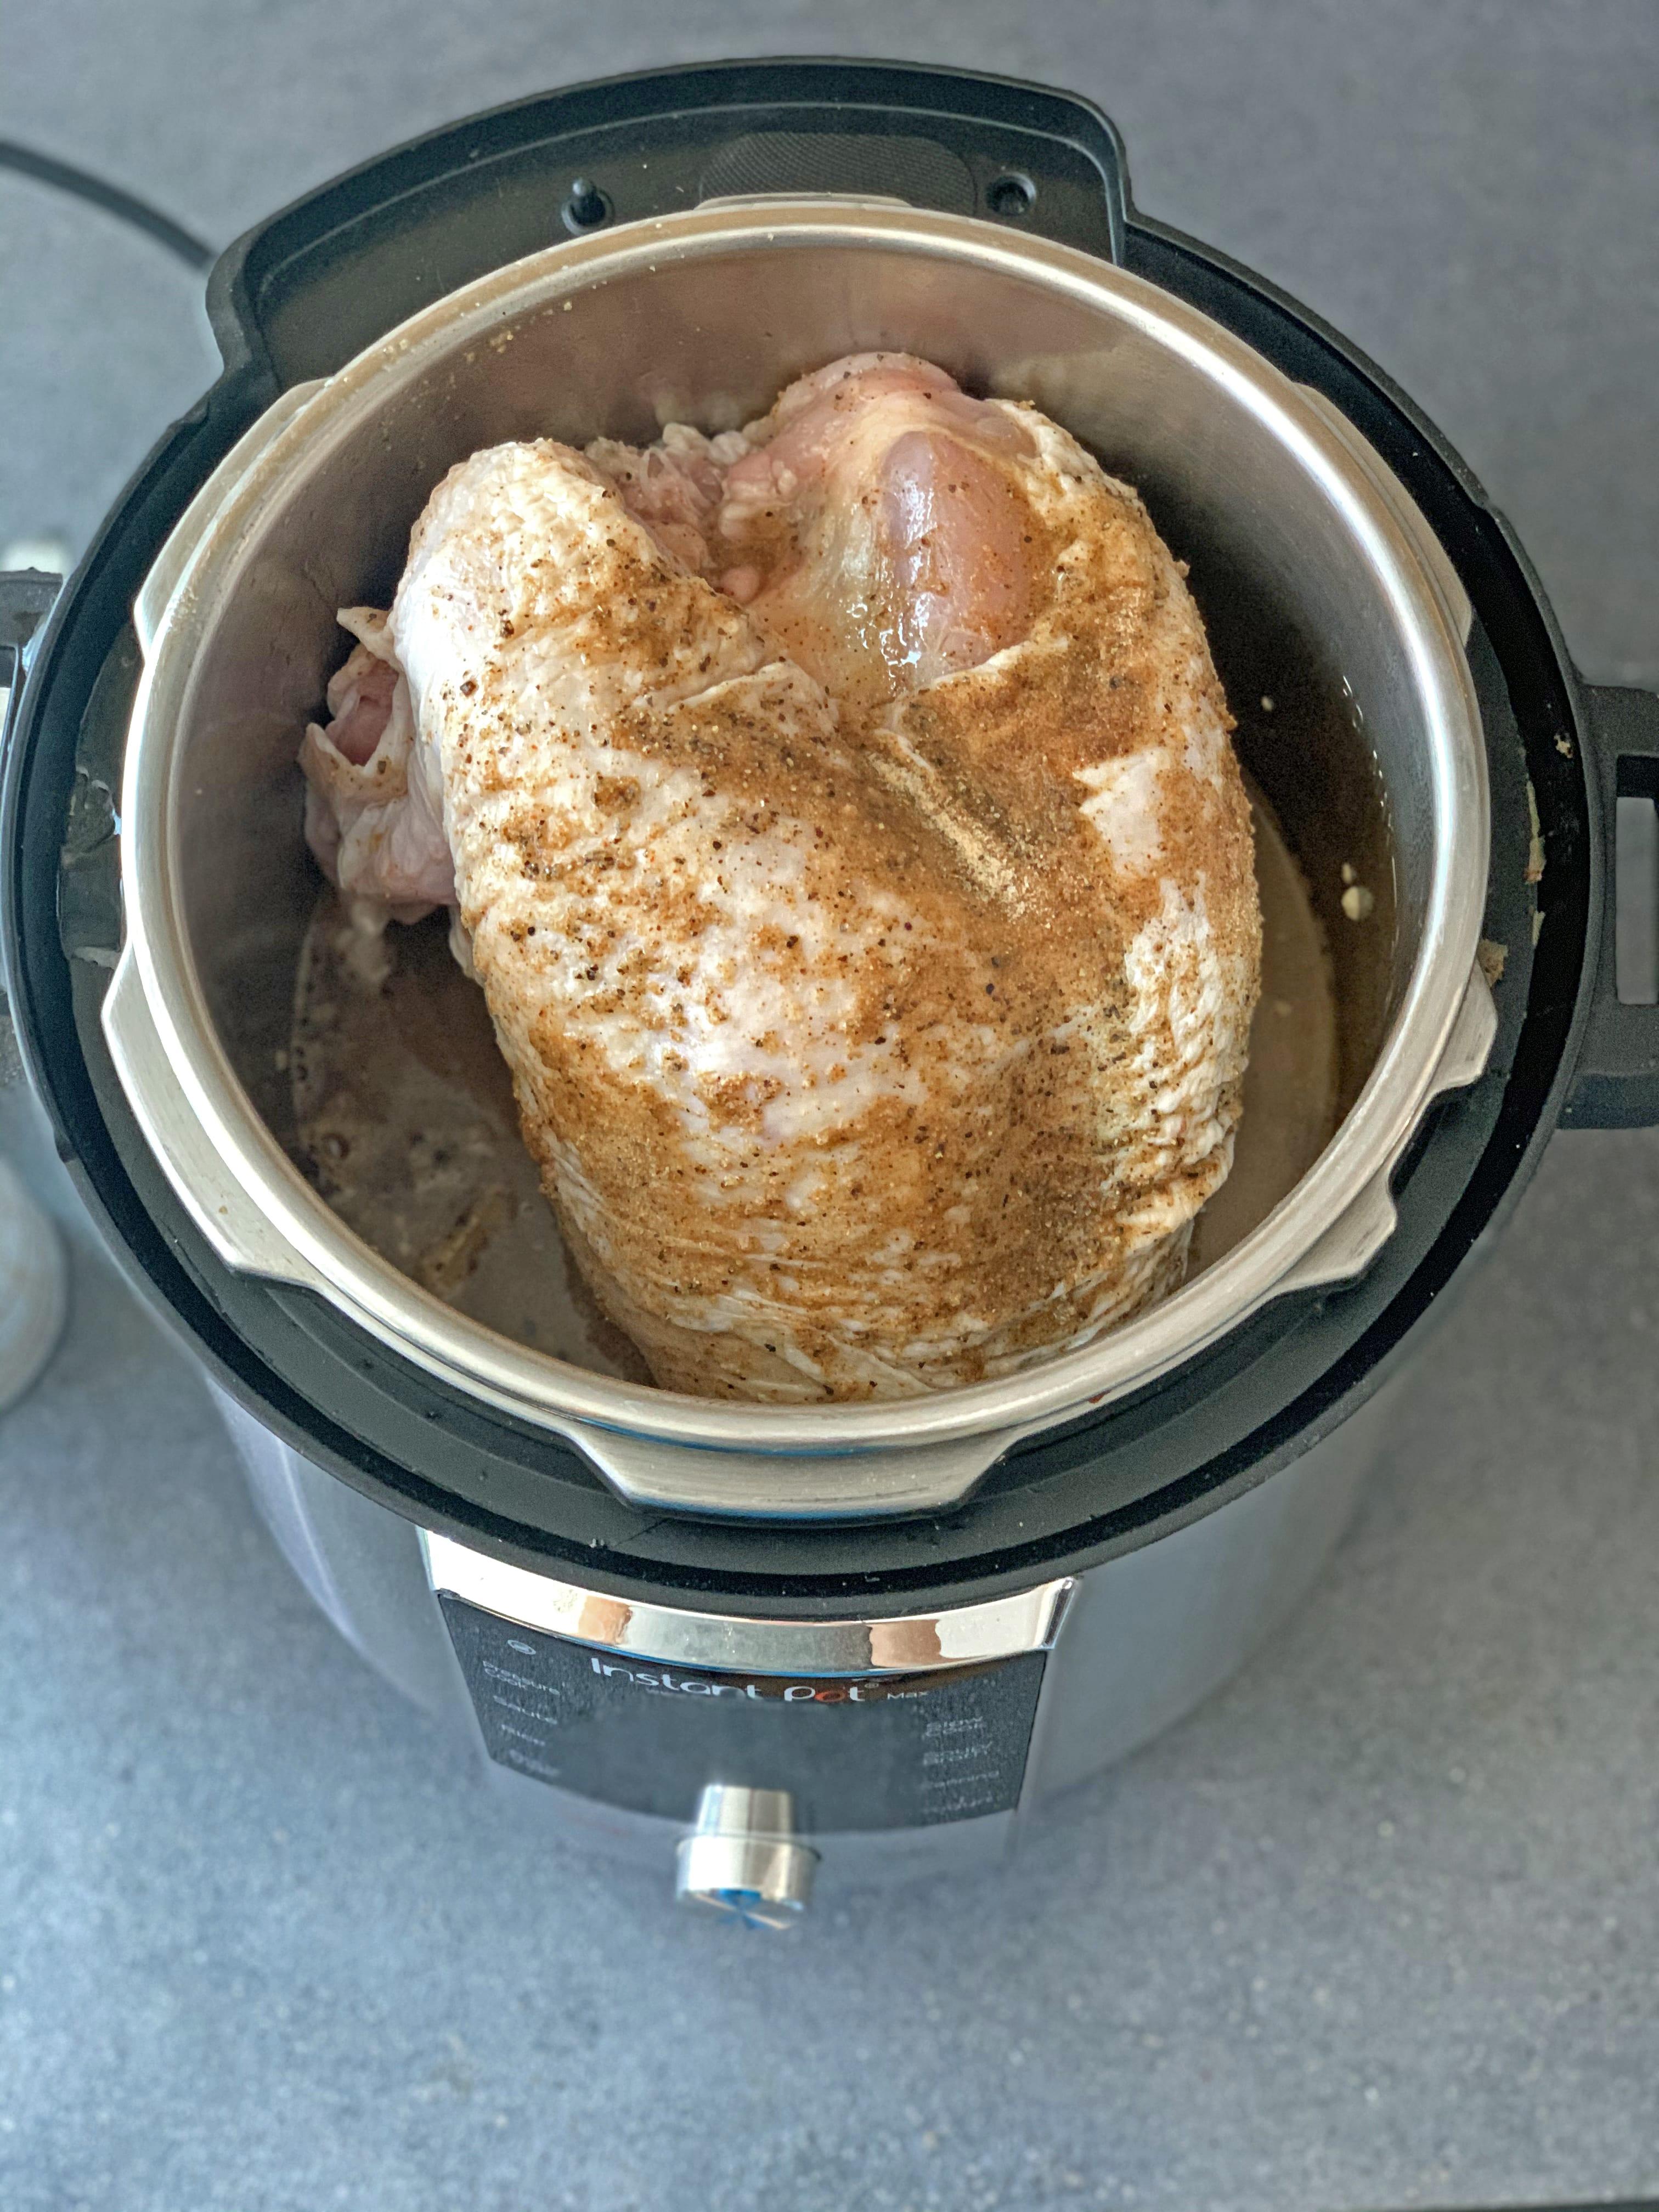 Cajun Instant Pot Turkey Breast in the instant pot